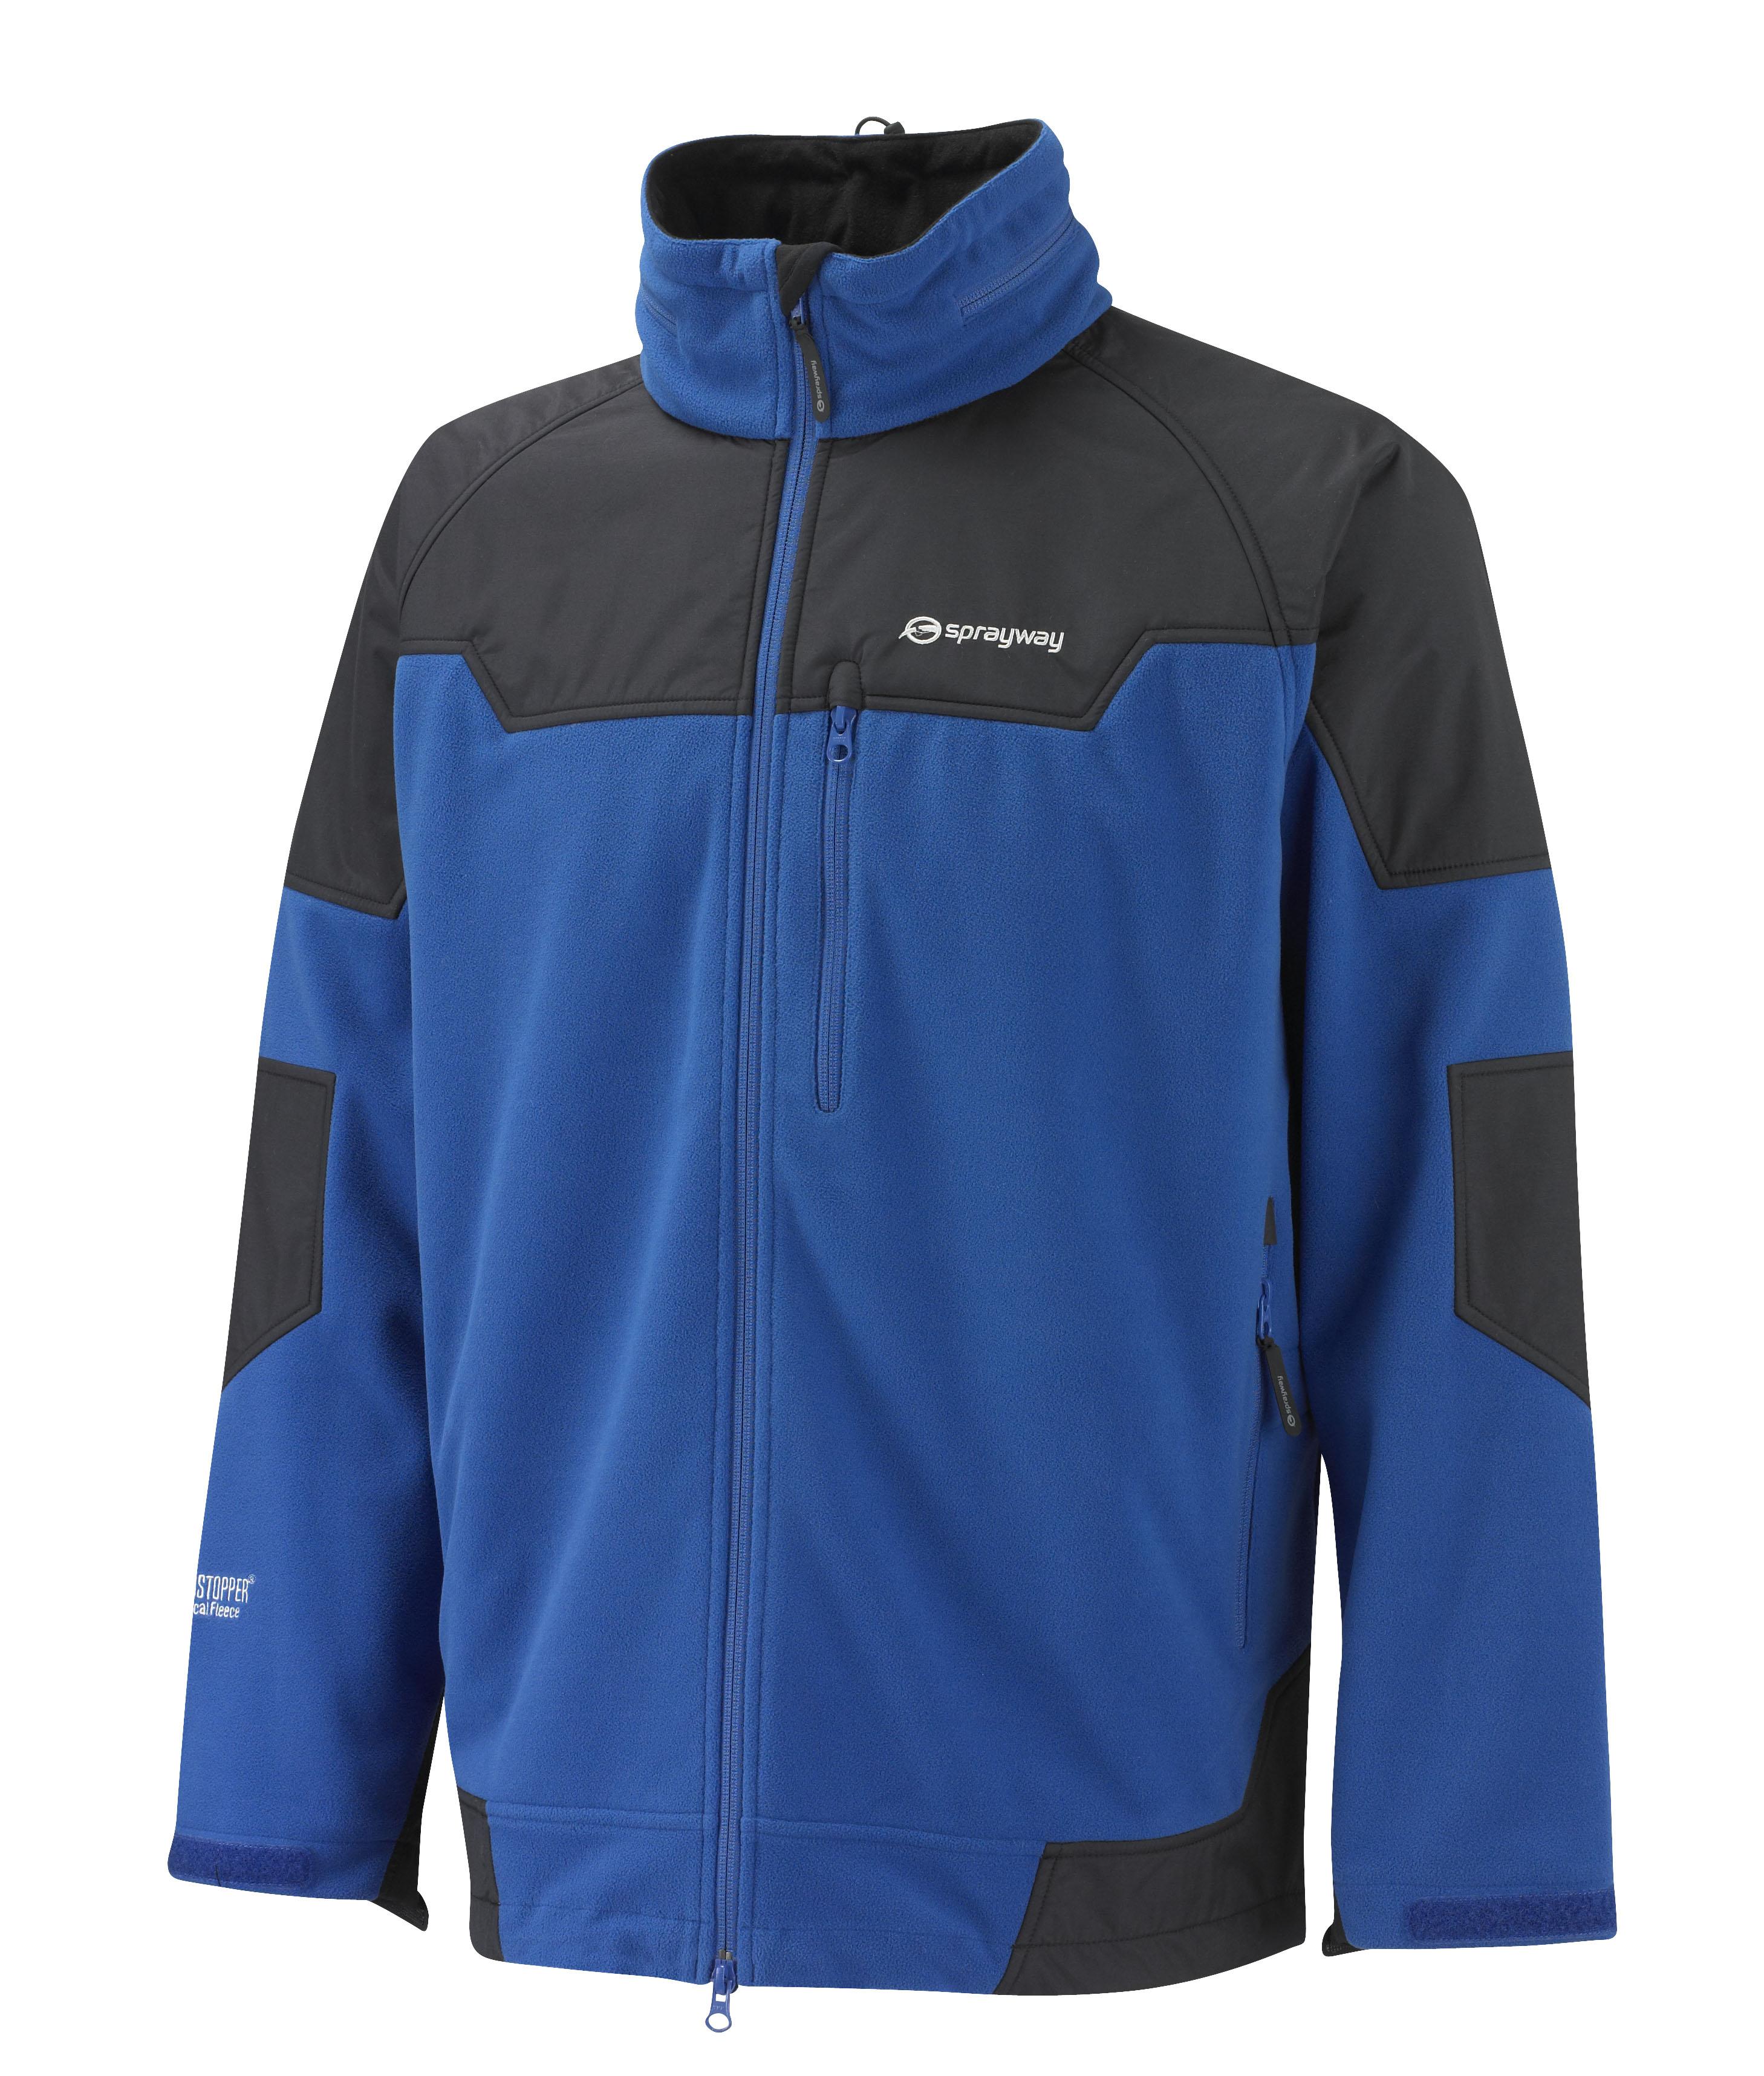 Mountain gear outerwear